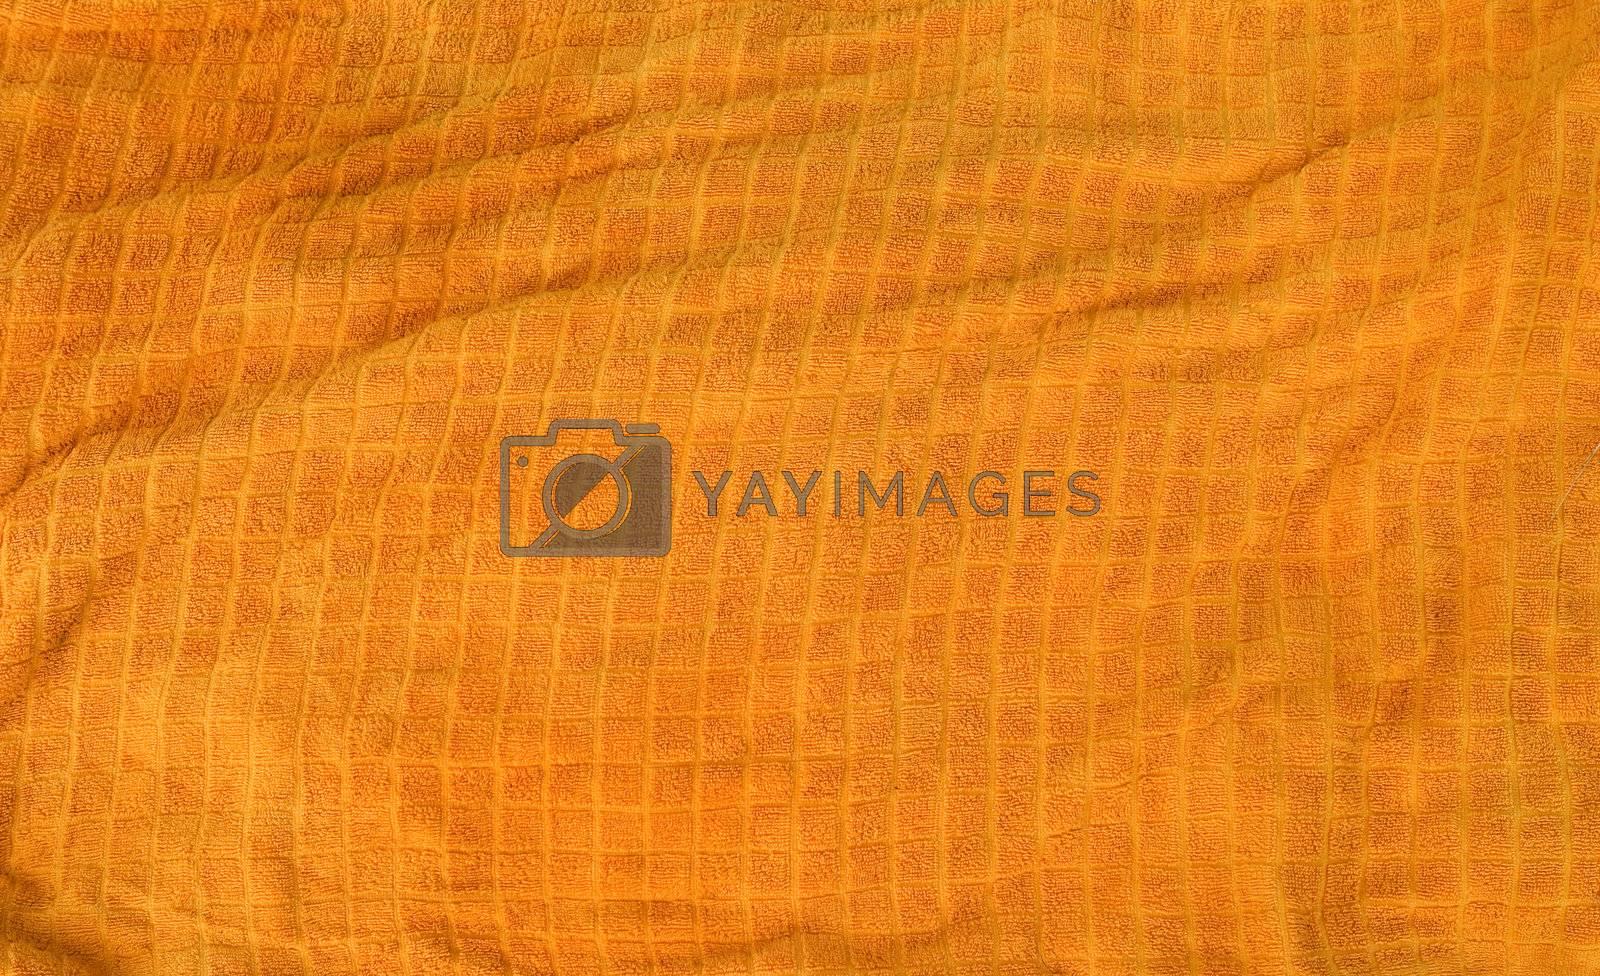 A bright orange cloth towl background texture